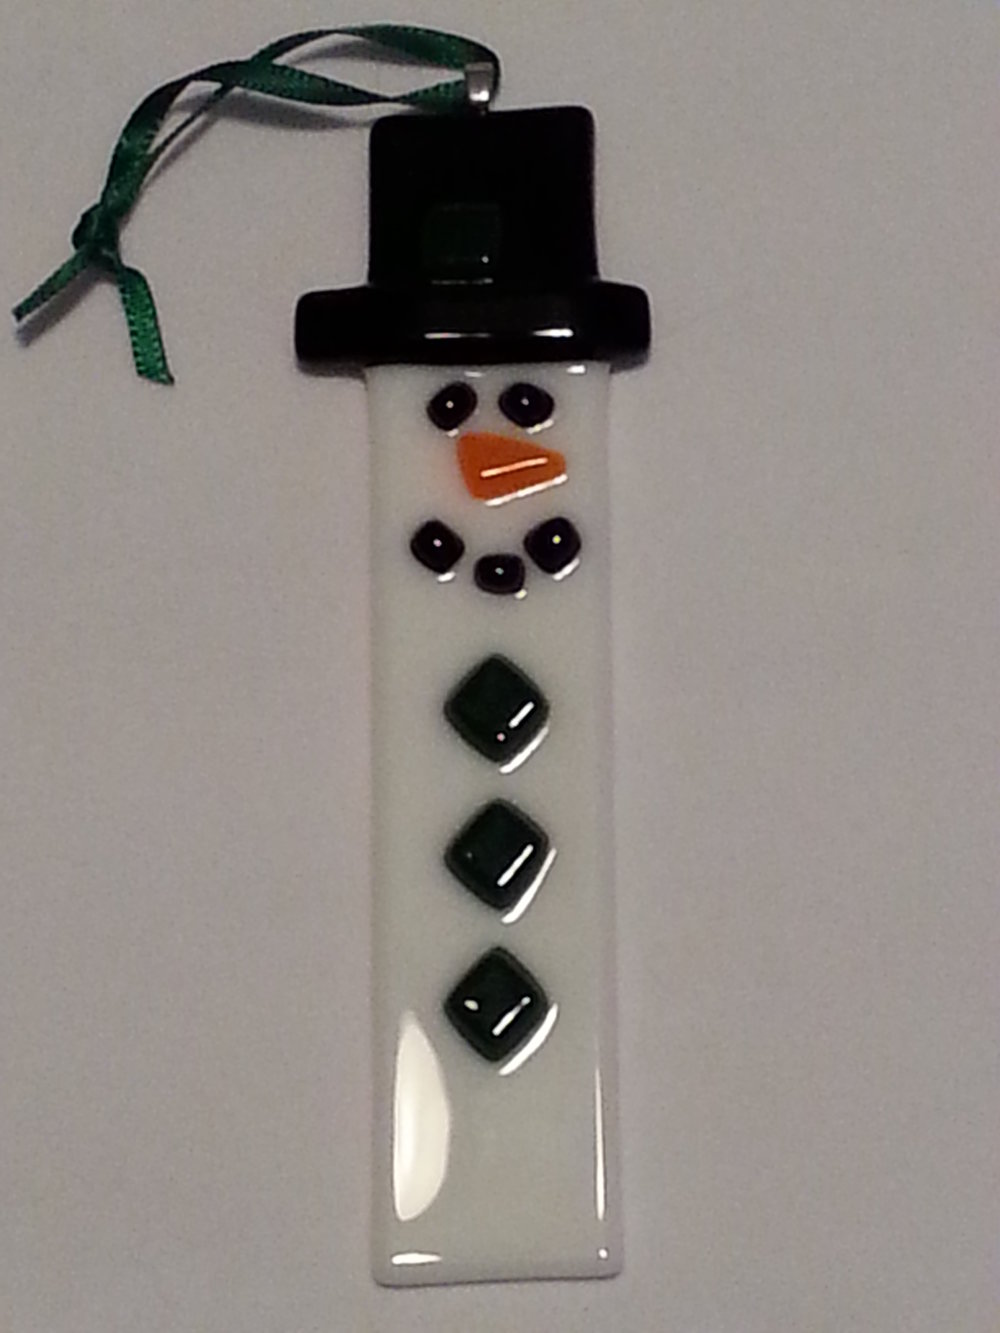 James Brown Snowman Ornament 1 1x4 KFG 20.jpg